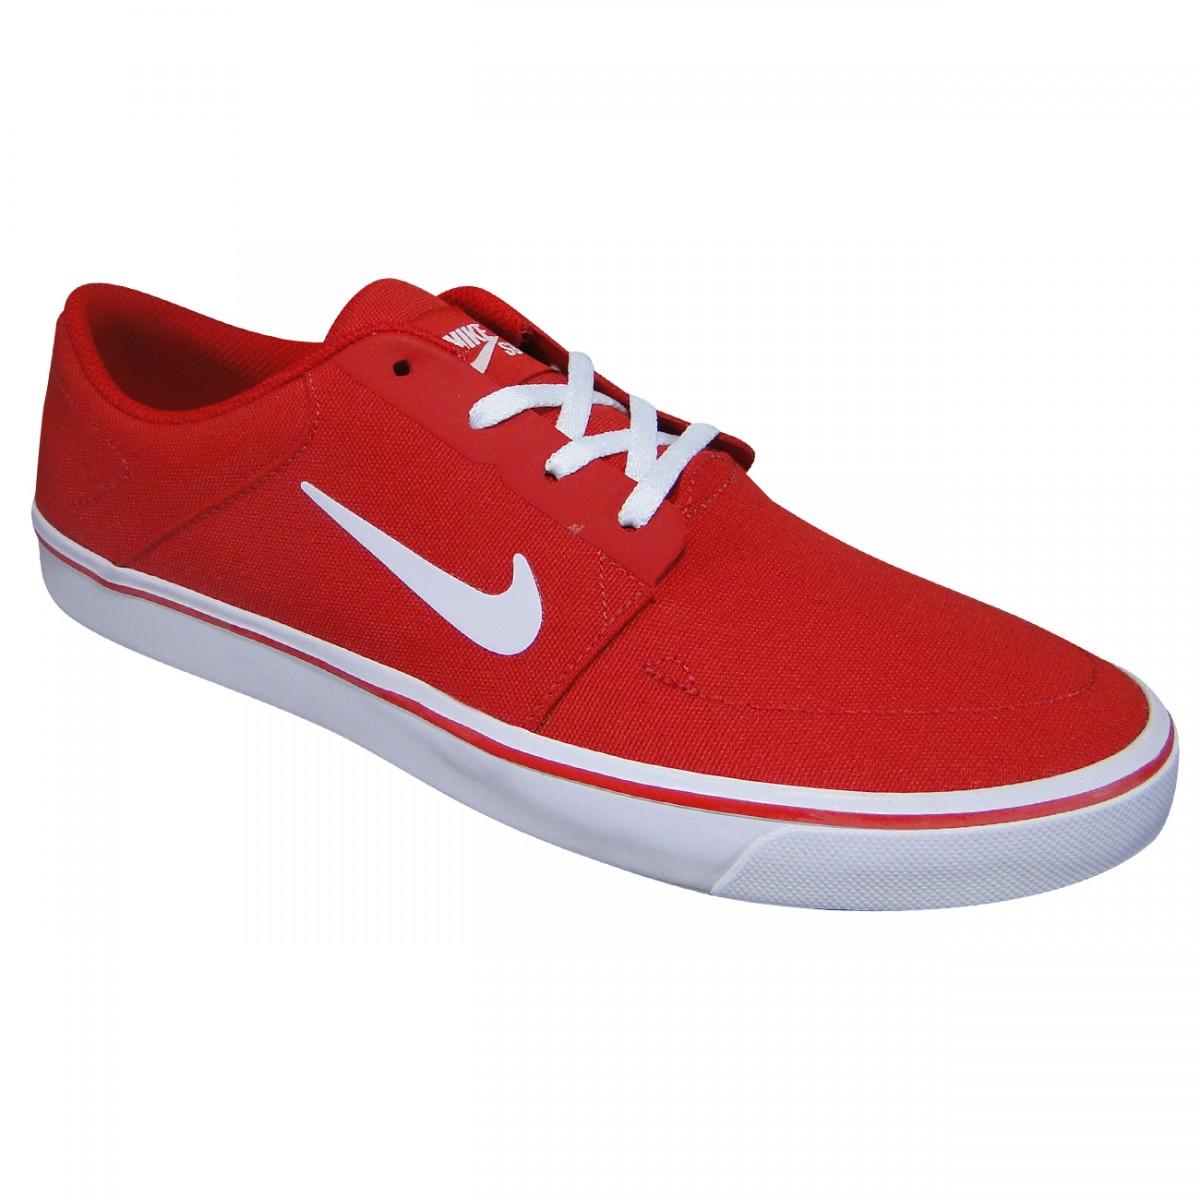 ccd0edd328d Tenis Nike Sb Portmore 723874 612 - Vermelho Branco - Chuteira Nike ...